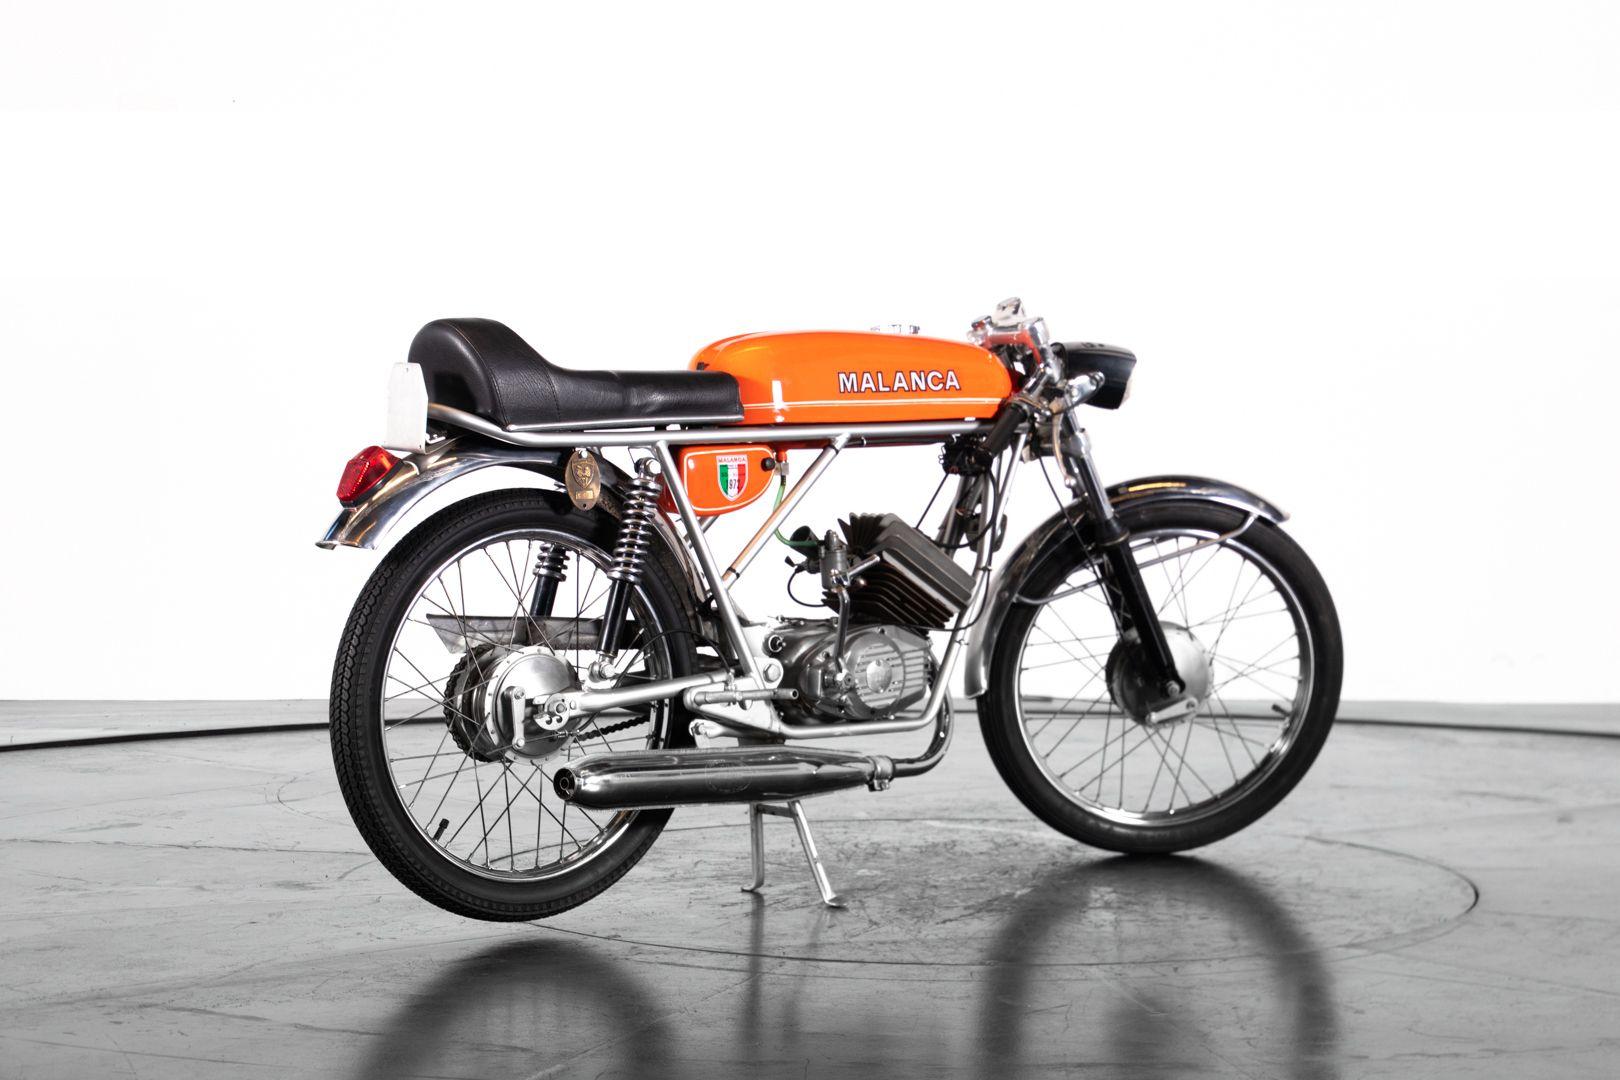 1975 Malanca DTR 49145